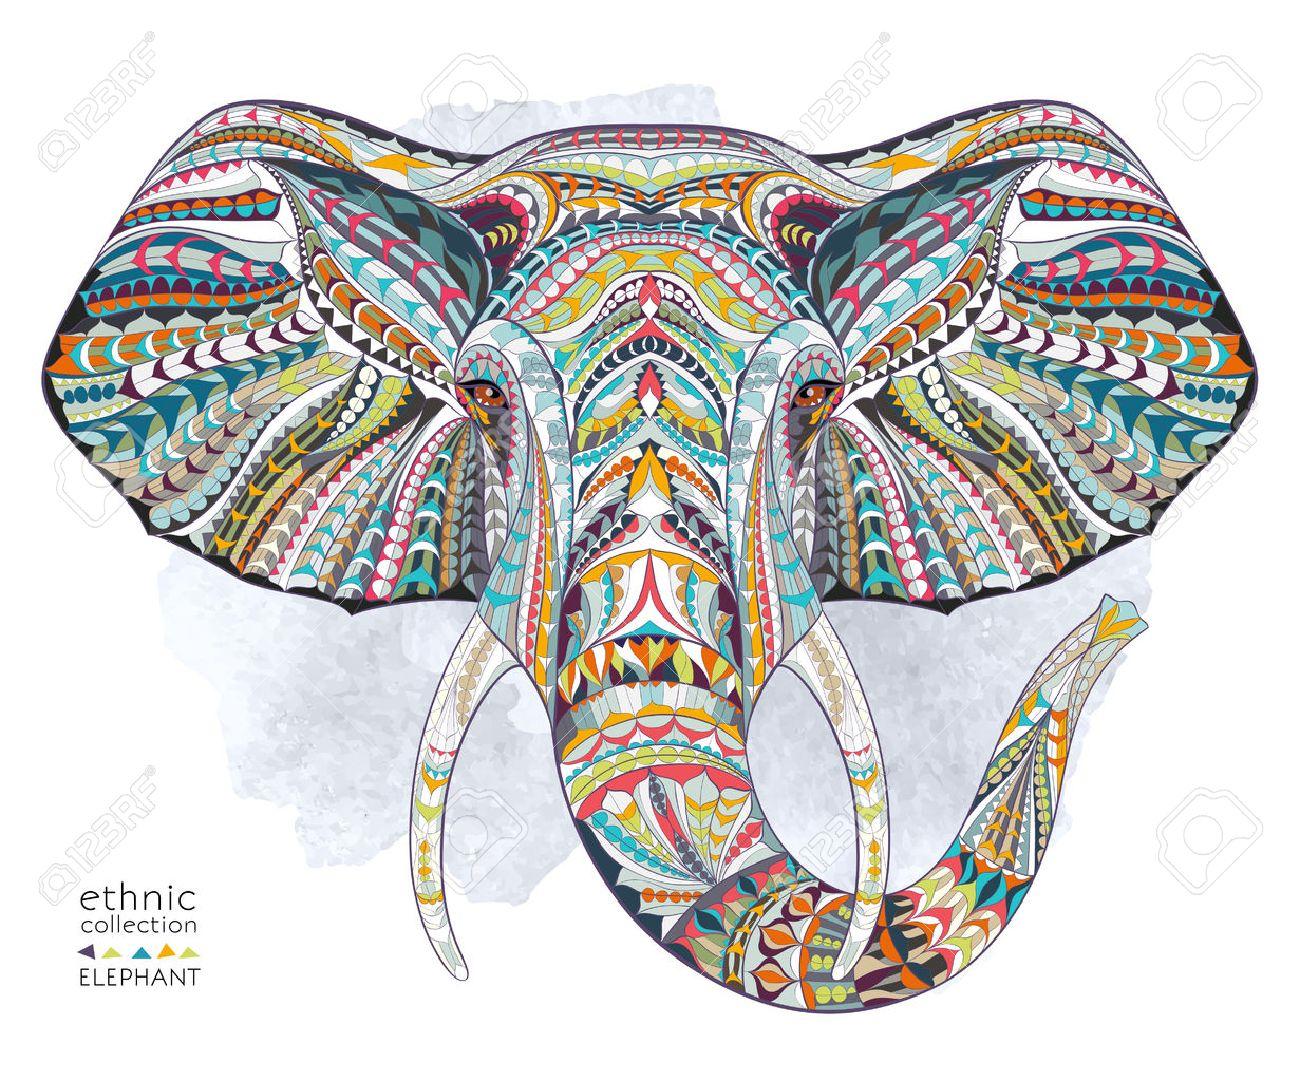 Dibujos De Elefantes Indios Wwwimagenesmycom